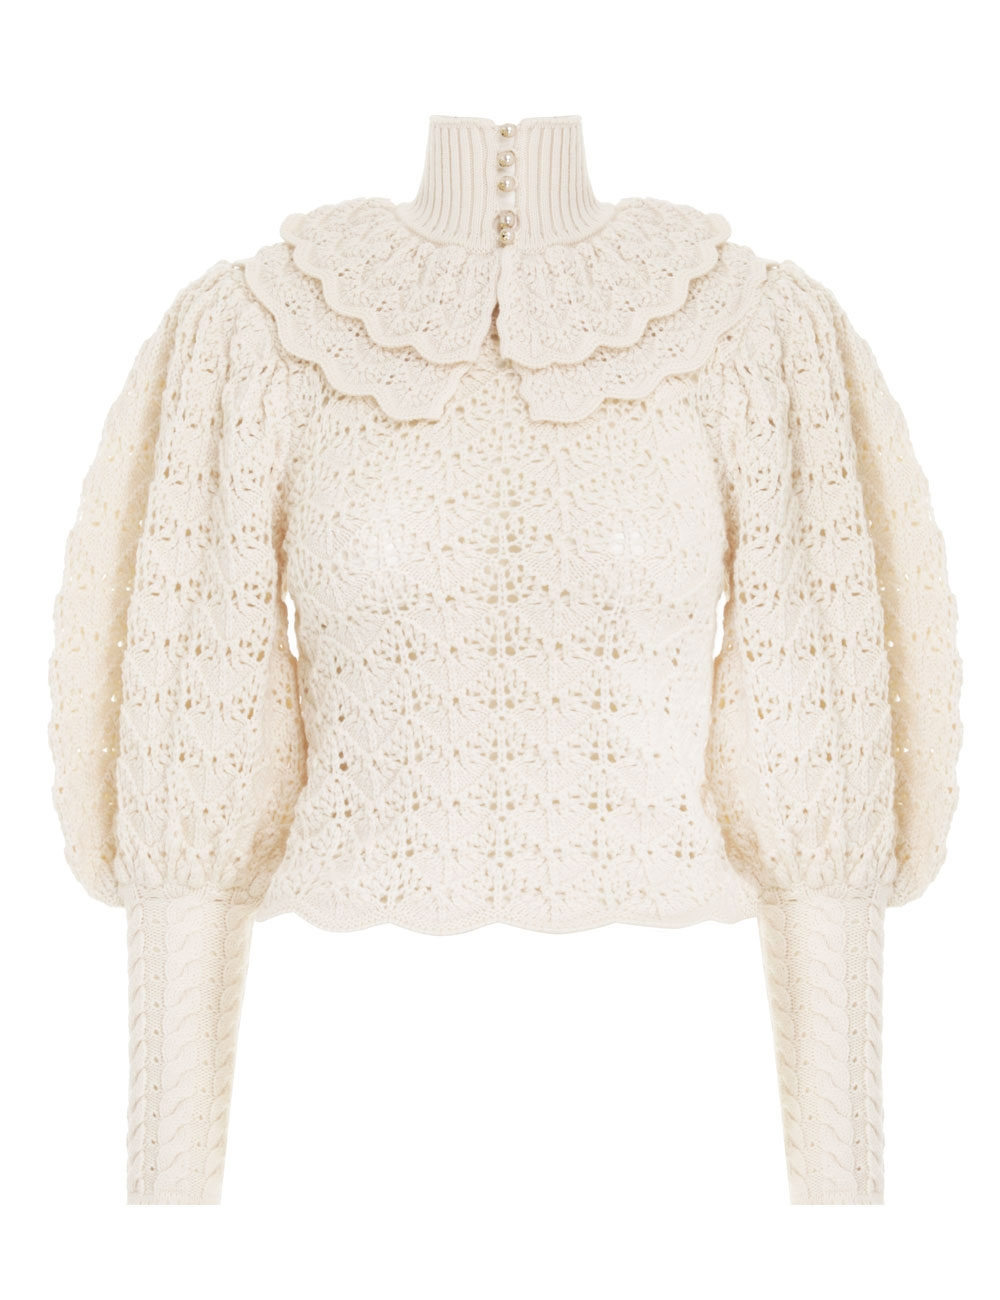 Ladybeetle Crochet Sweater